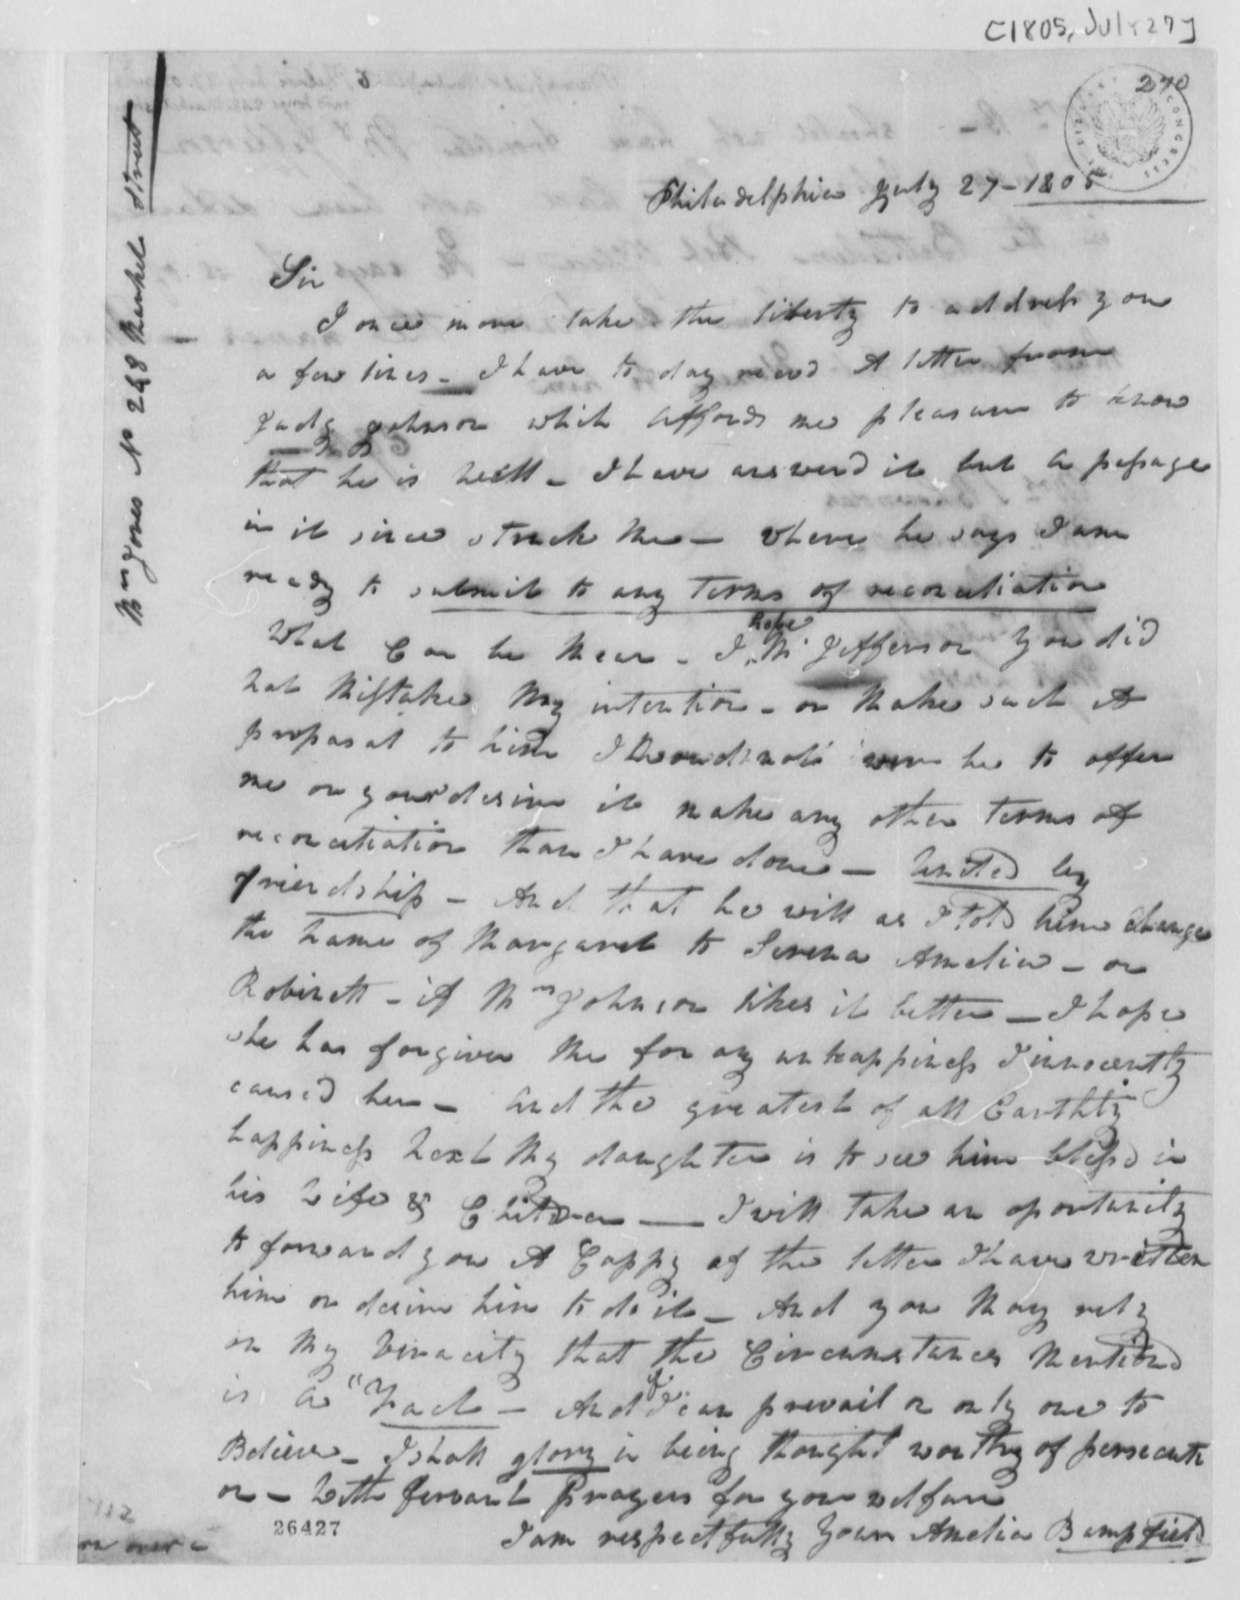 Elizabeth G. Bampfield to Thomas Jefferson, July 27, 1805